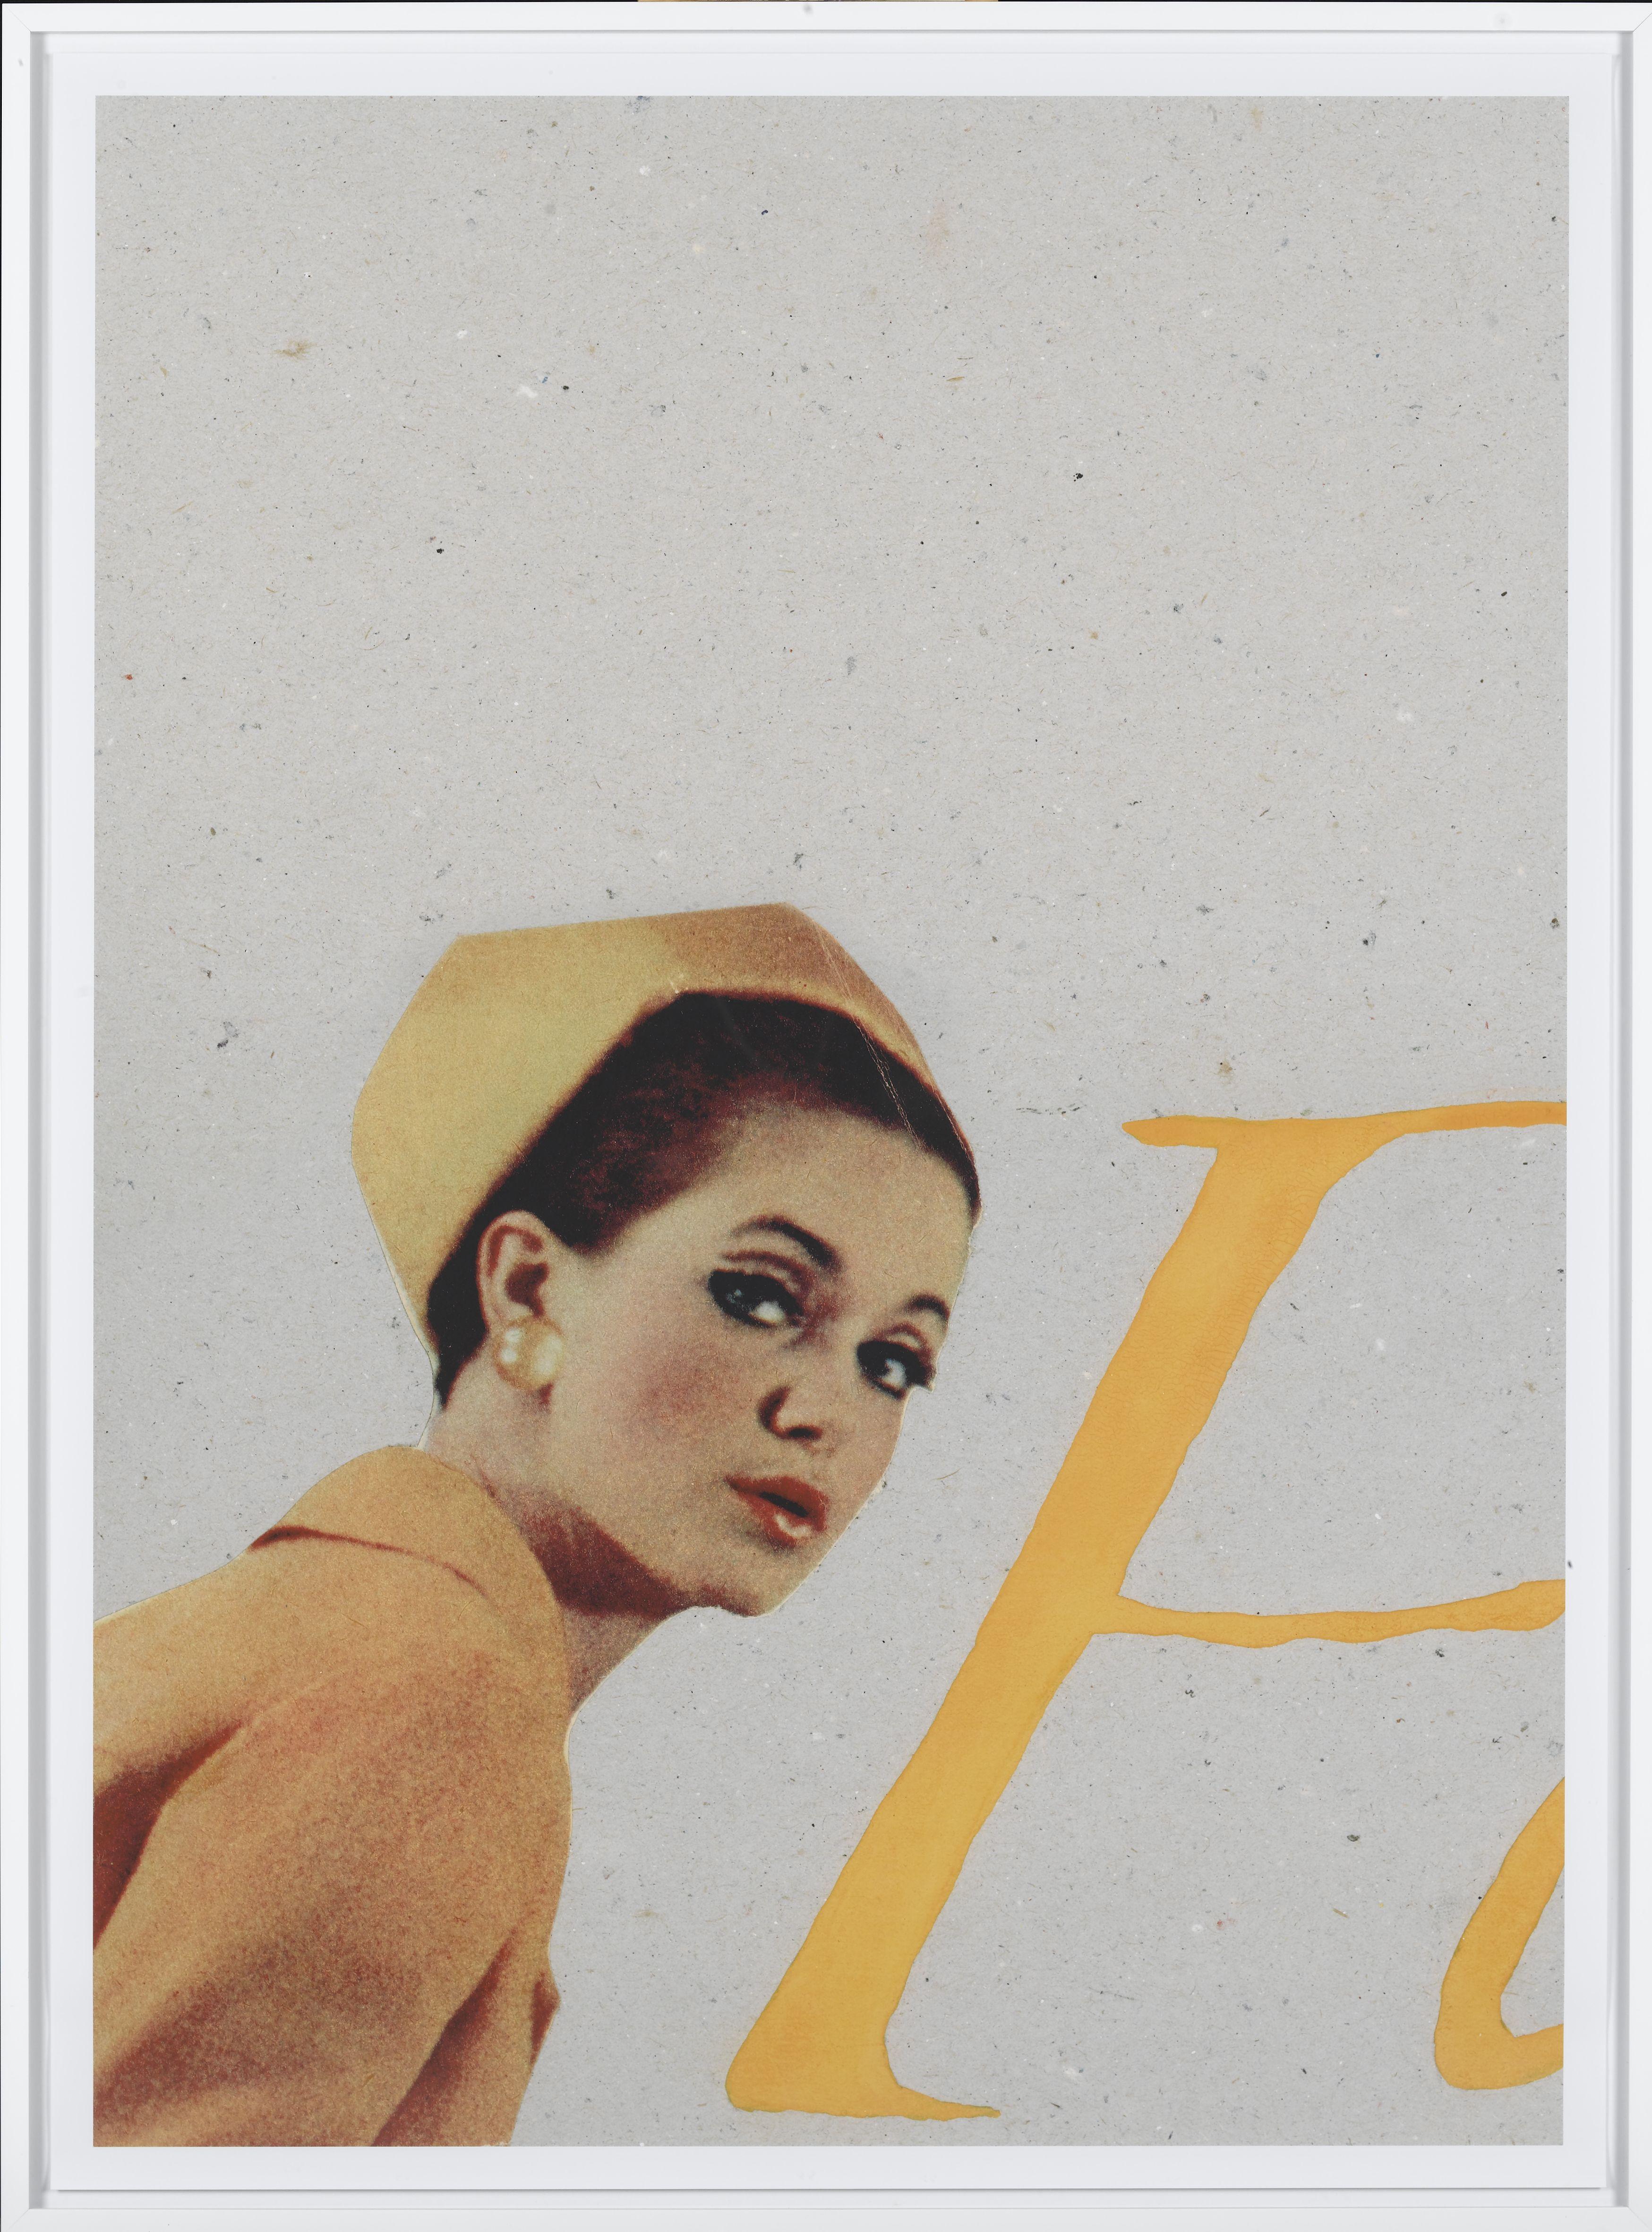 Paulina Ołowska, Accidental Collages, 2004 Collectie Stedelijk Museum Amsterdam_original